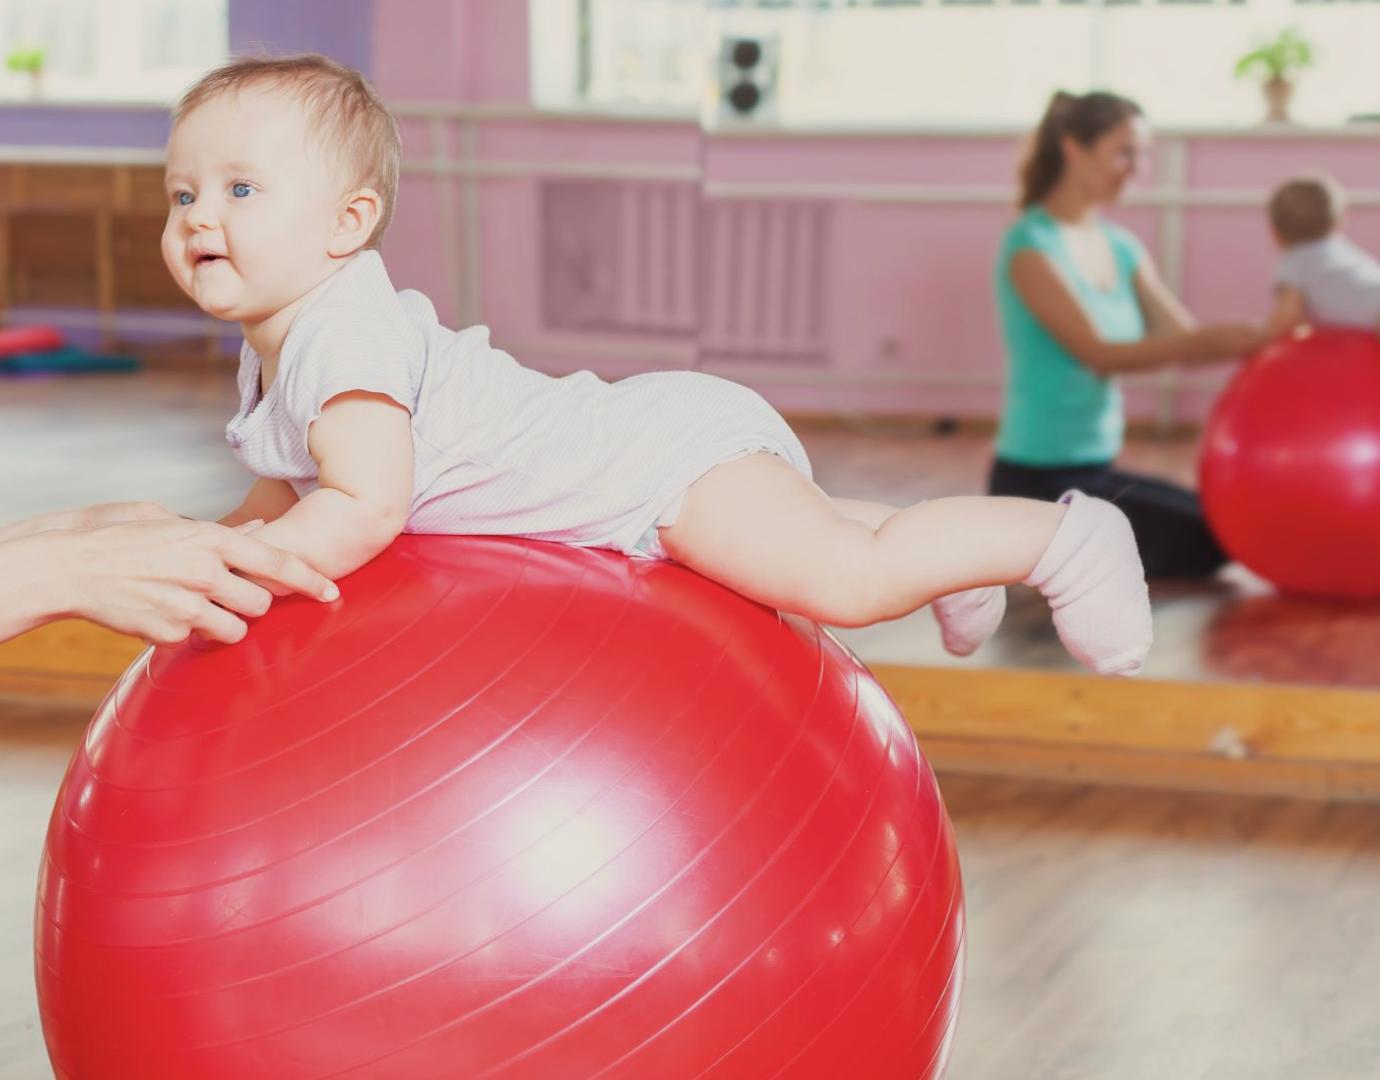 baby on ball movement development